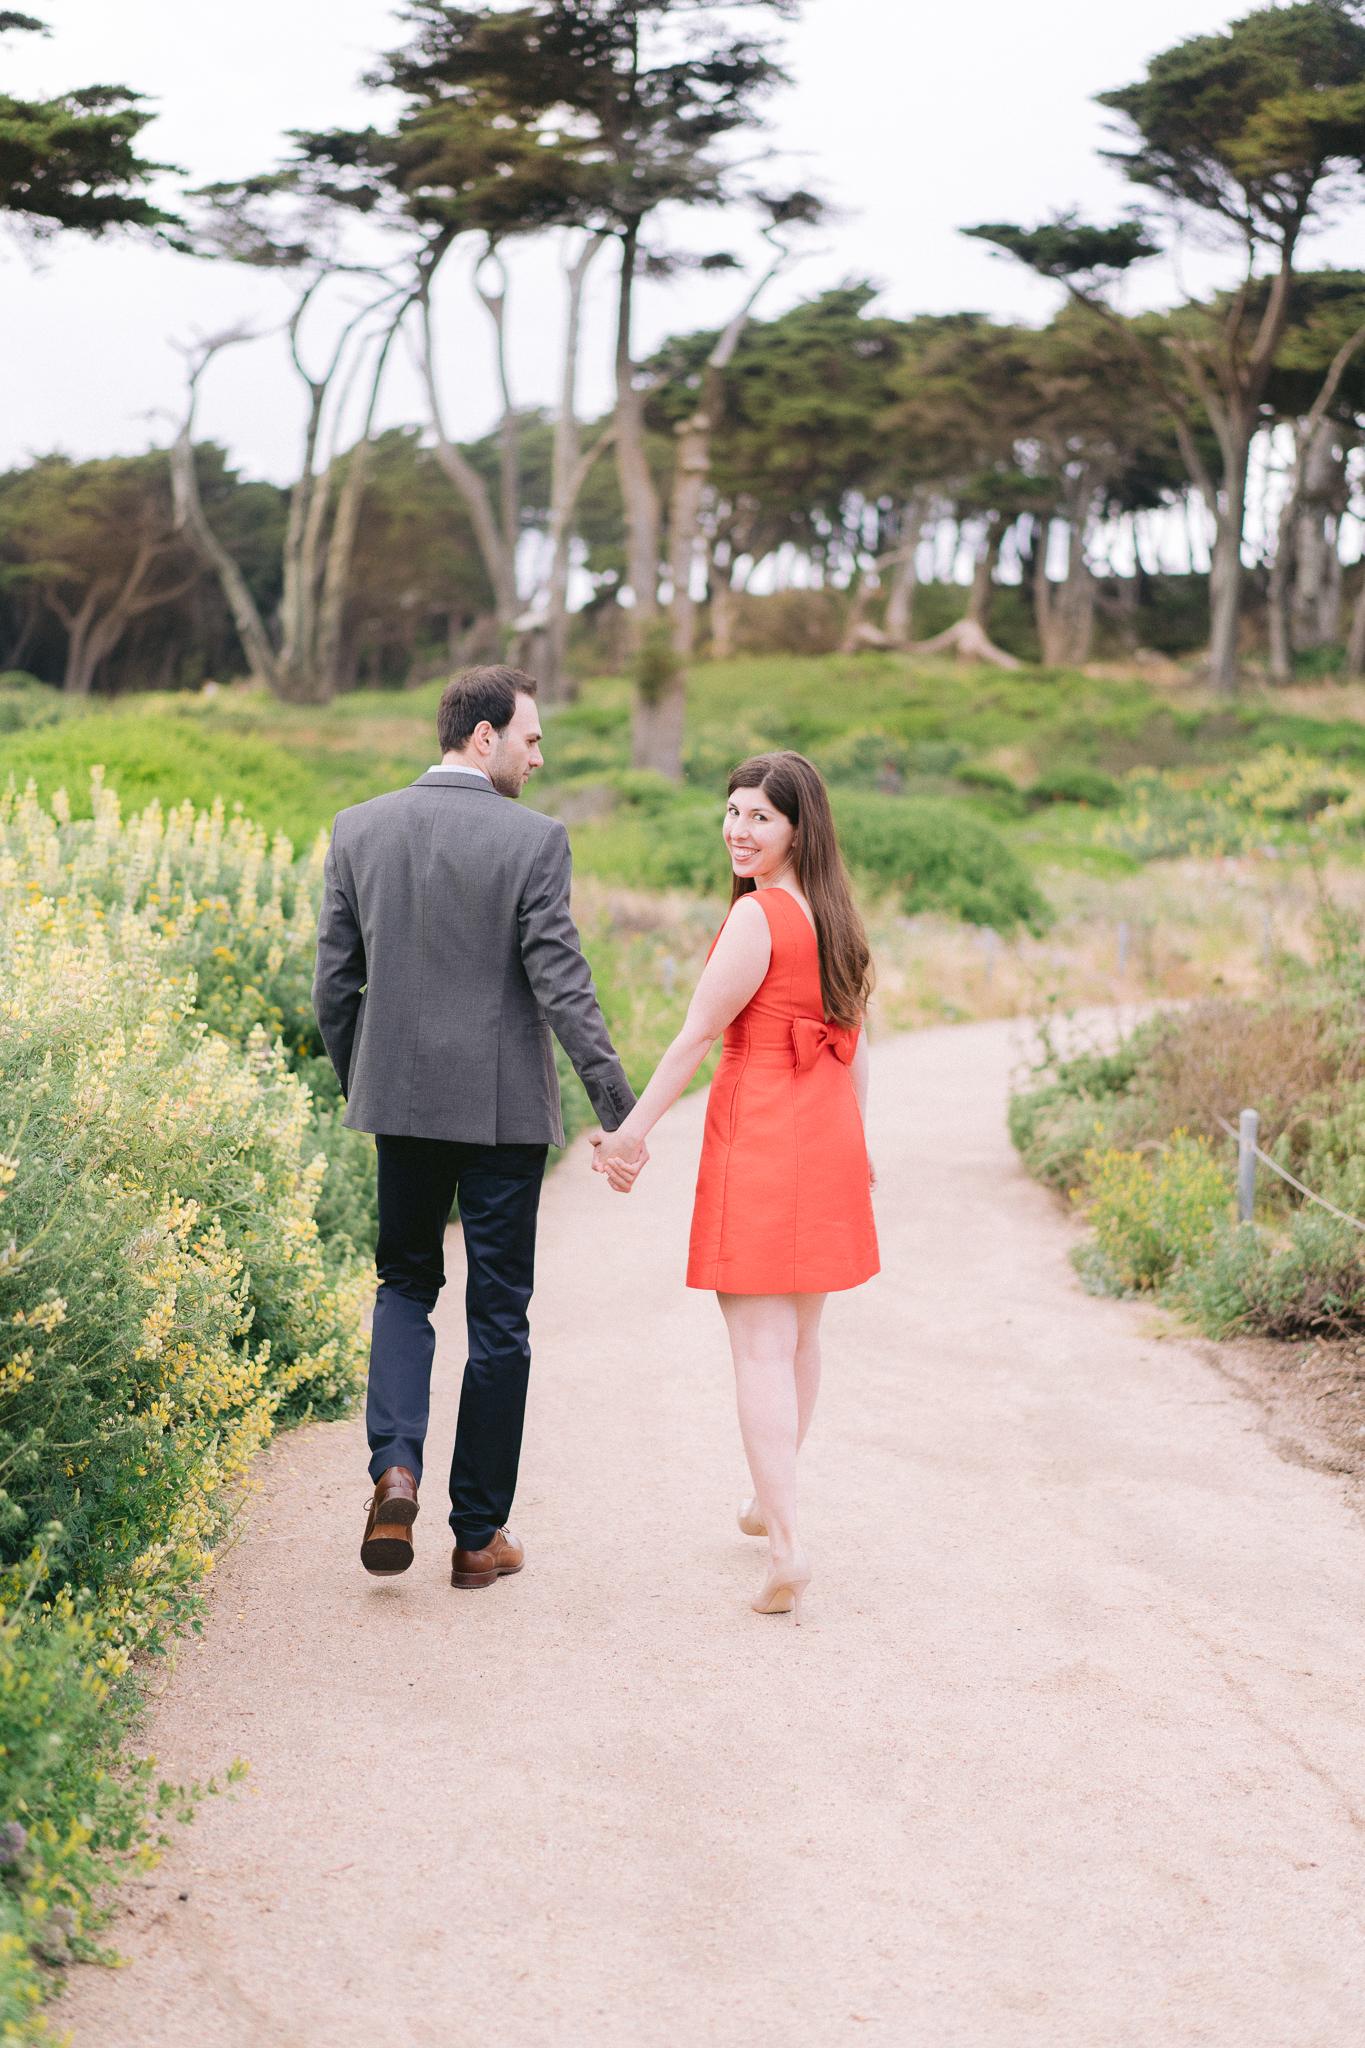 San Francisco Engagement, Baker Beach Engagement, Land's End engagement-51.jpg